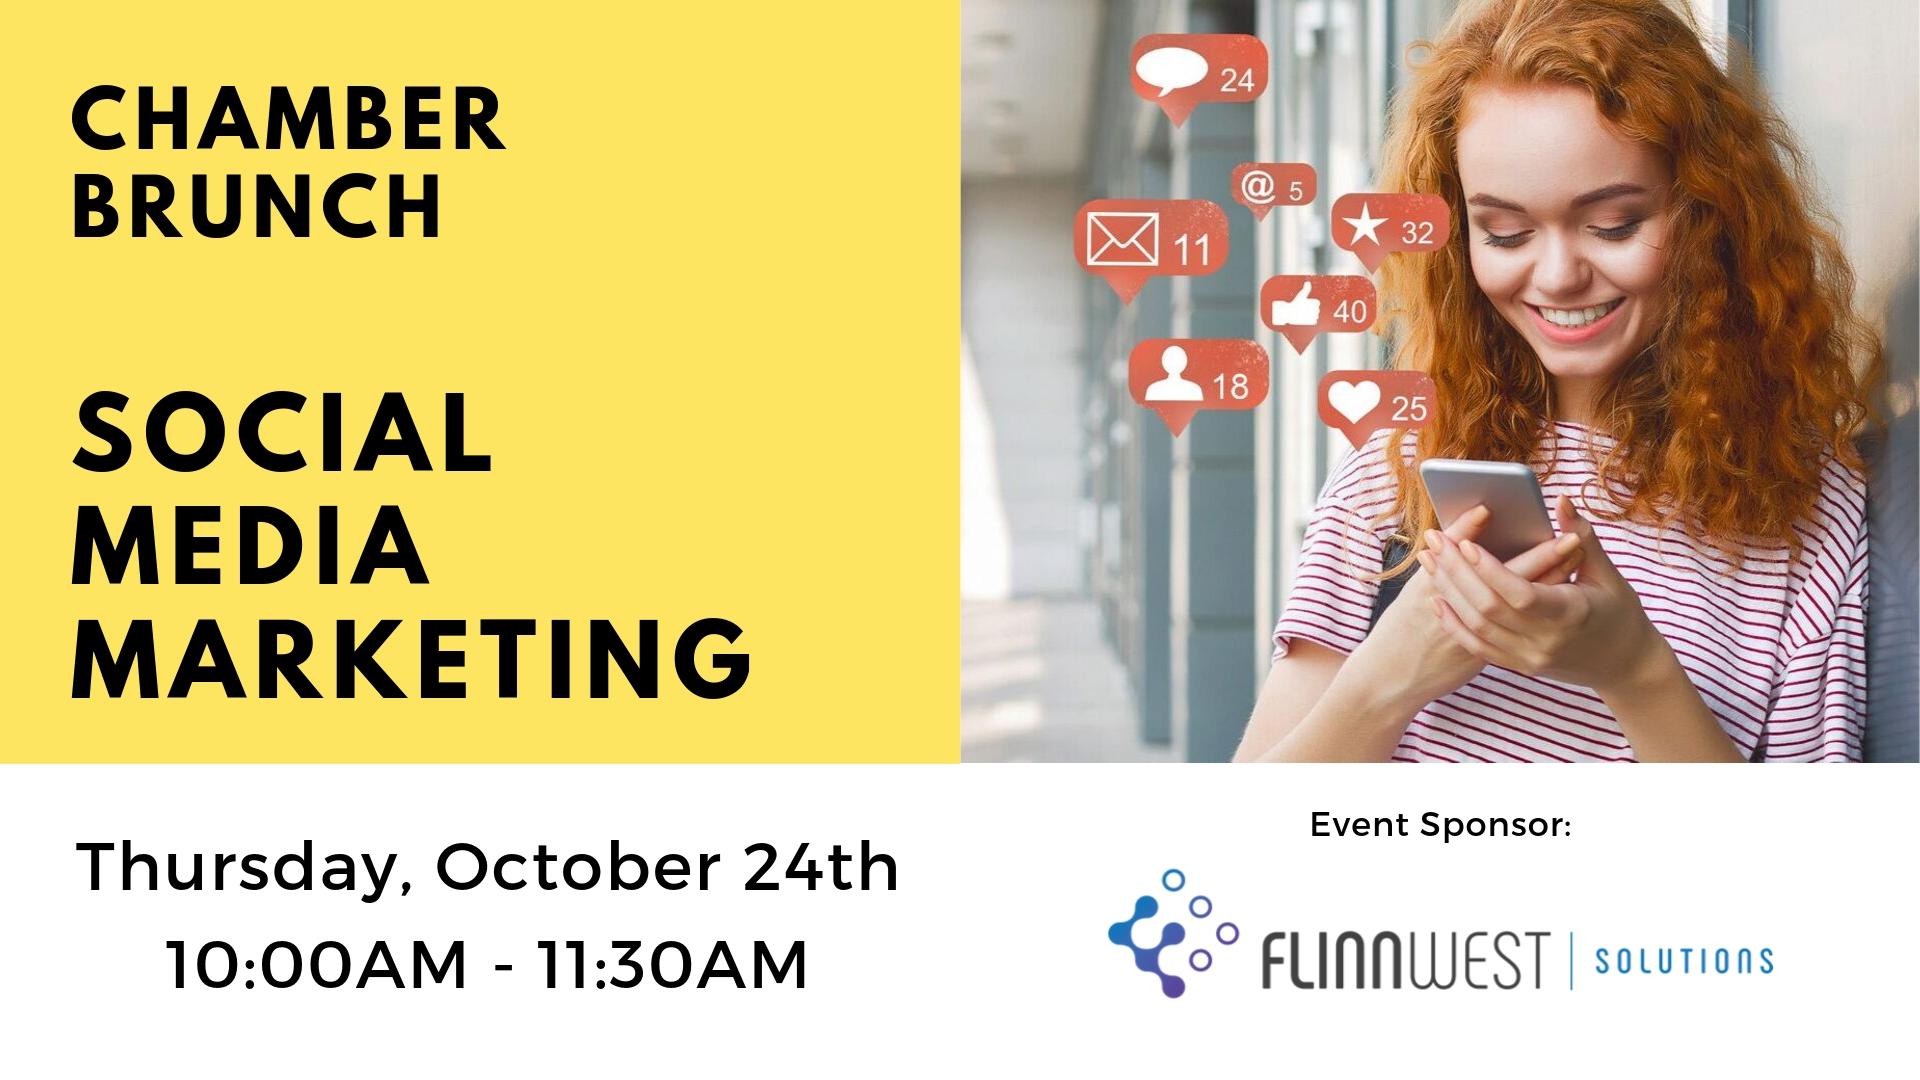 Flinnwest-Learning-Brunch-FB-Events.jpg